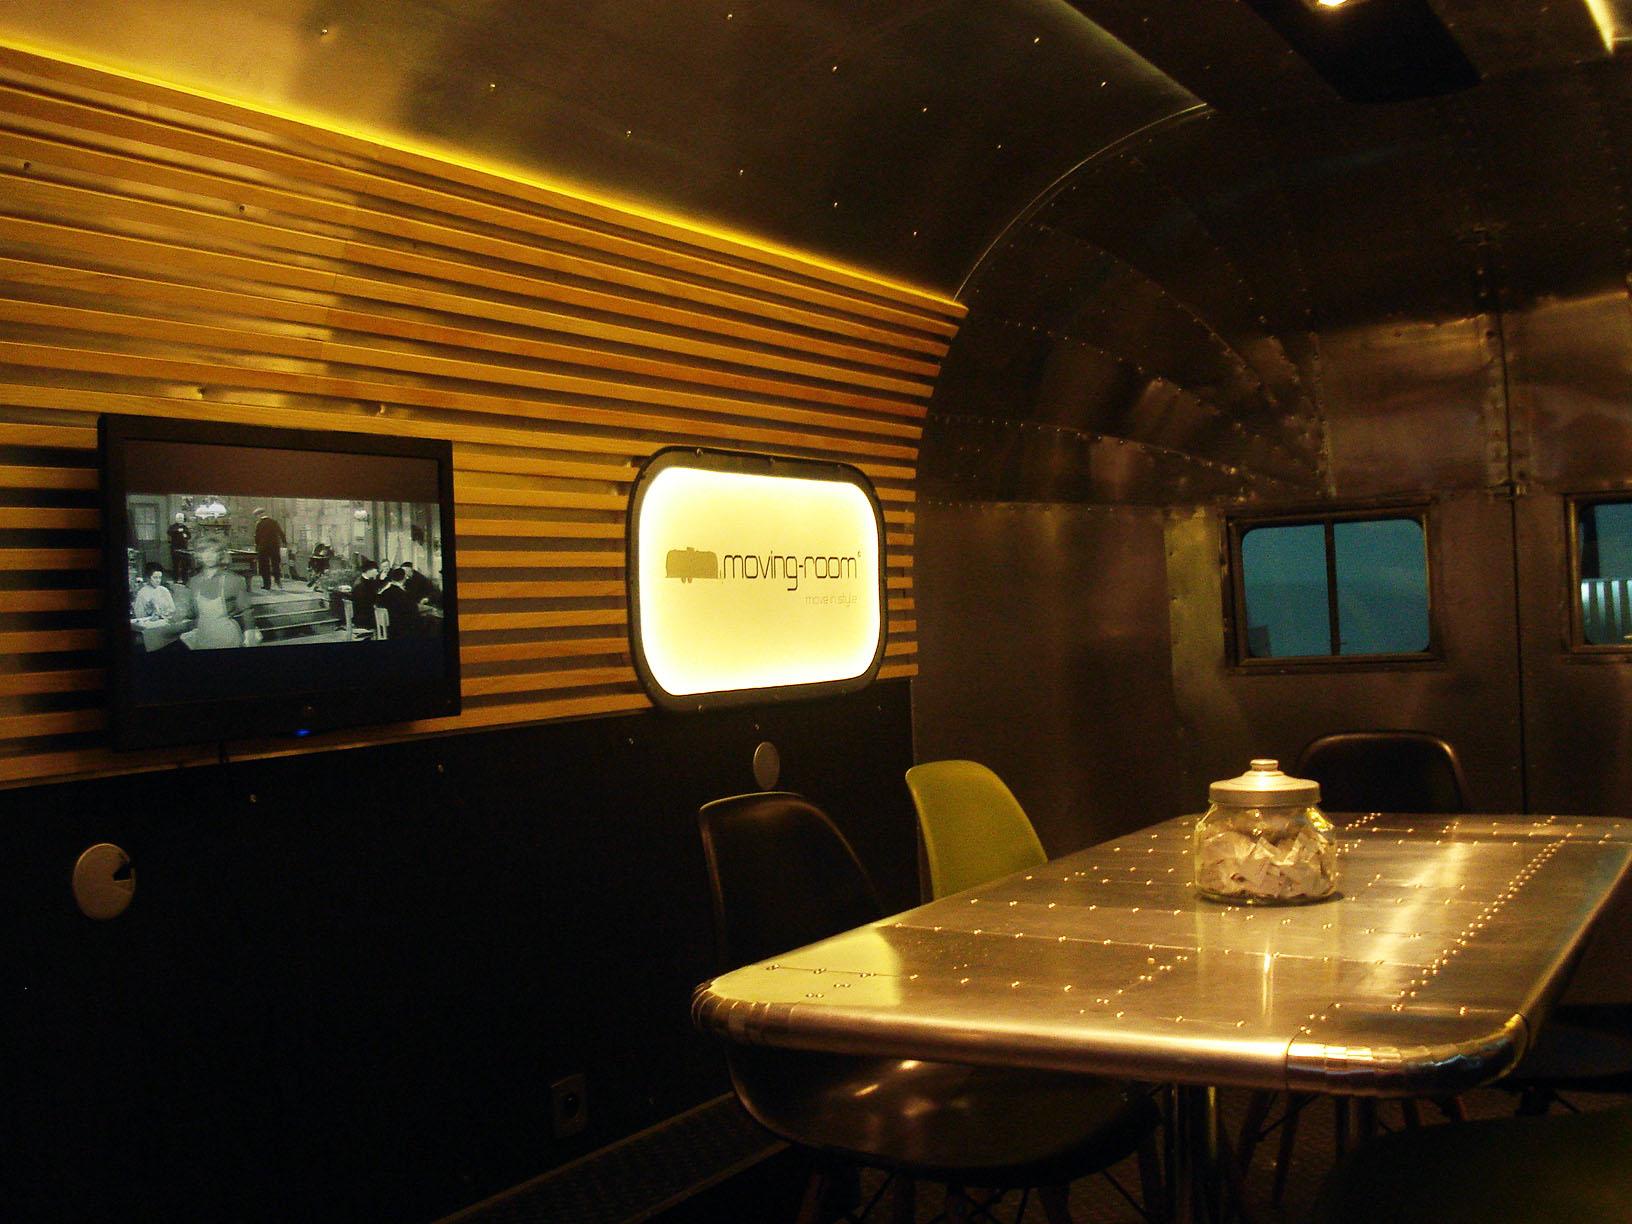 caravane airstream intérieur